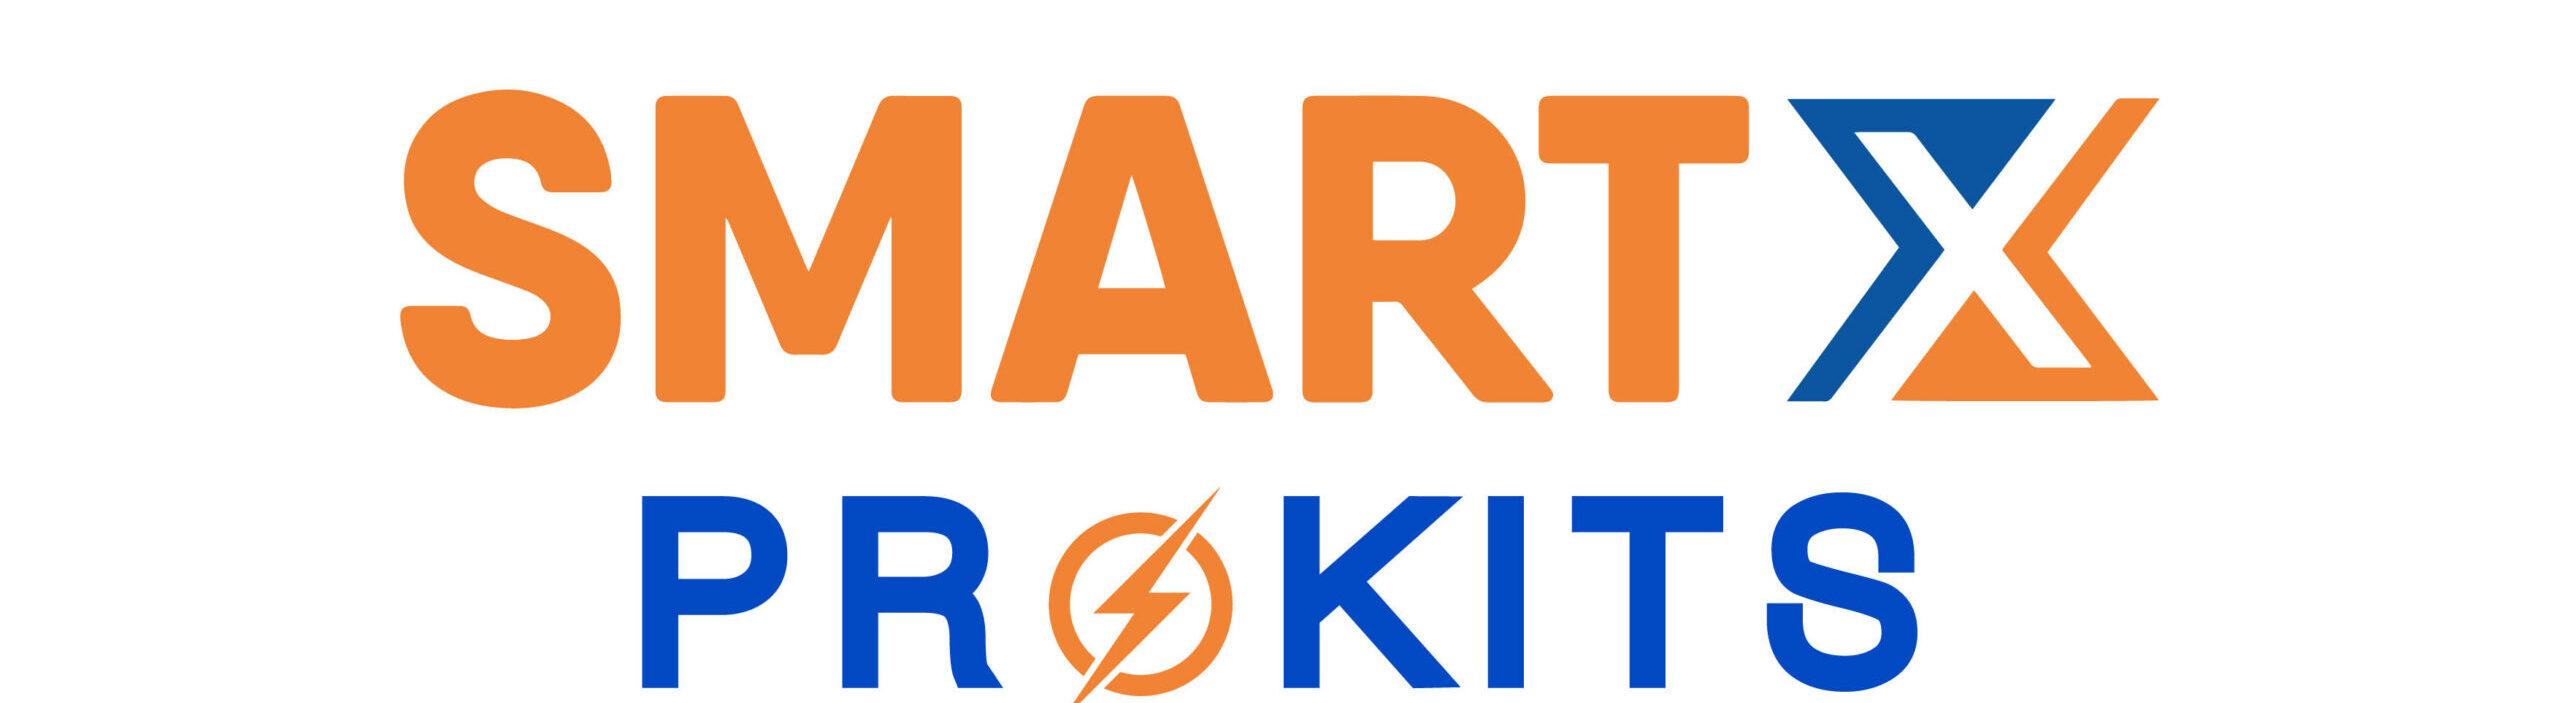 SmartXProkits